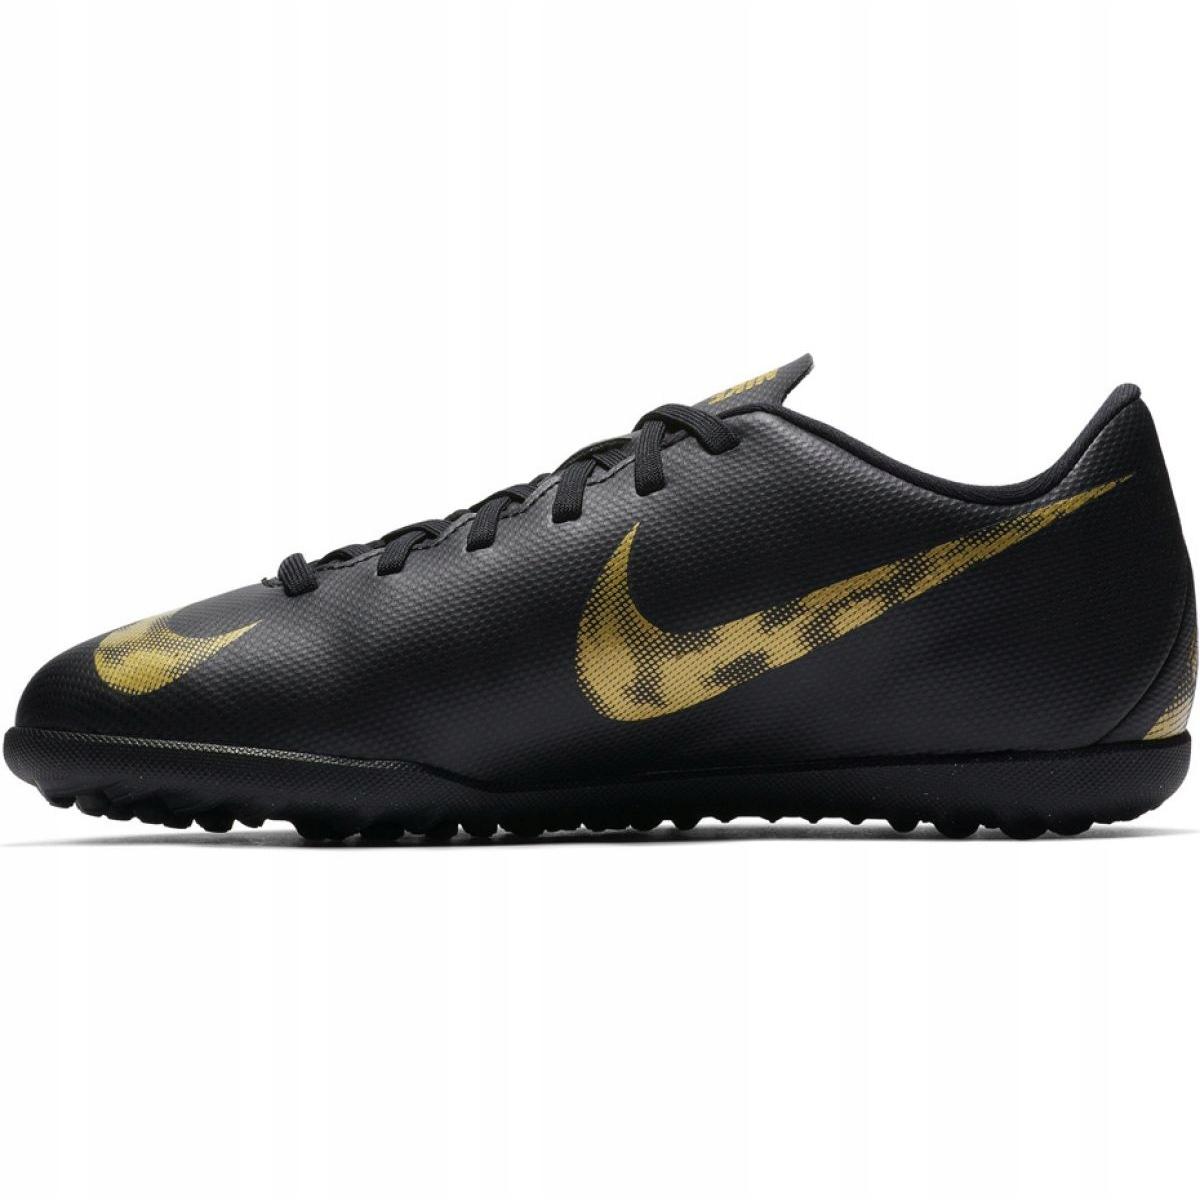 Encadenar robo Tener cuidado  Nike Mercurial Vapor X 12 Club Football Shoes Tf Jr AH7355-077 black  multicolored - ButyModne.pl